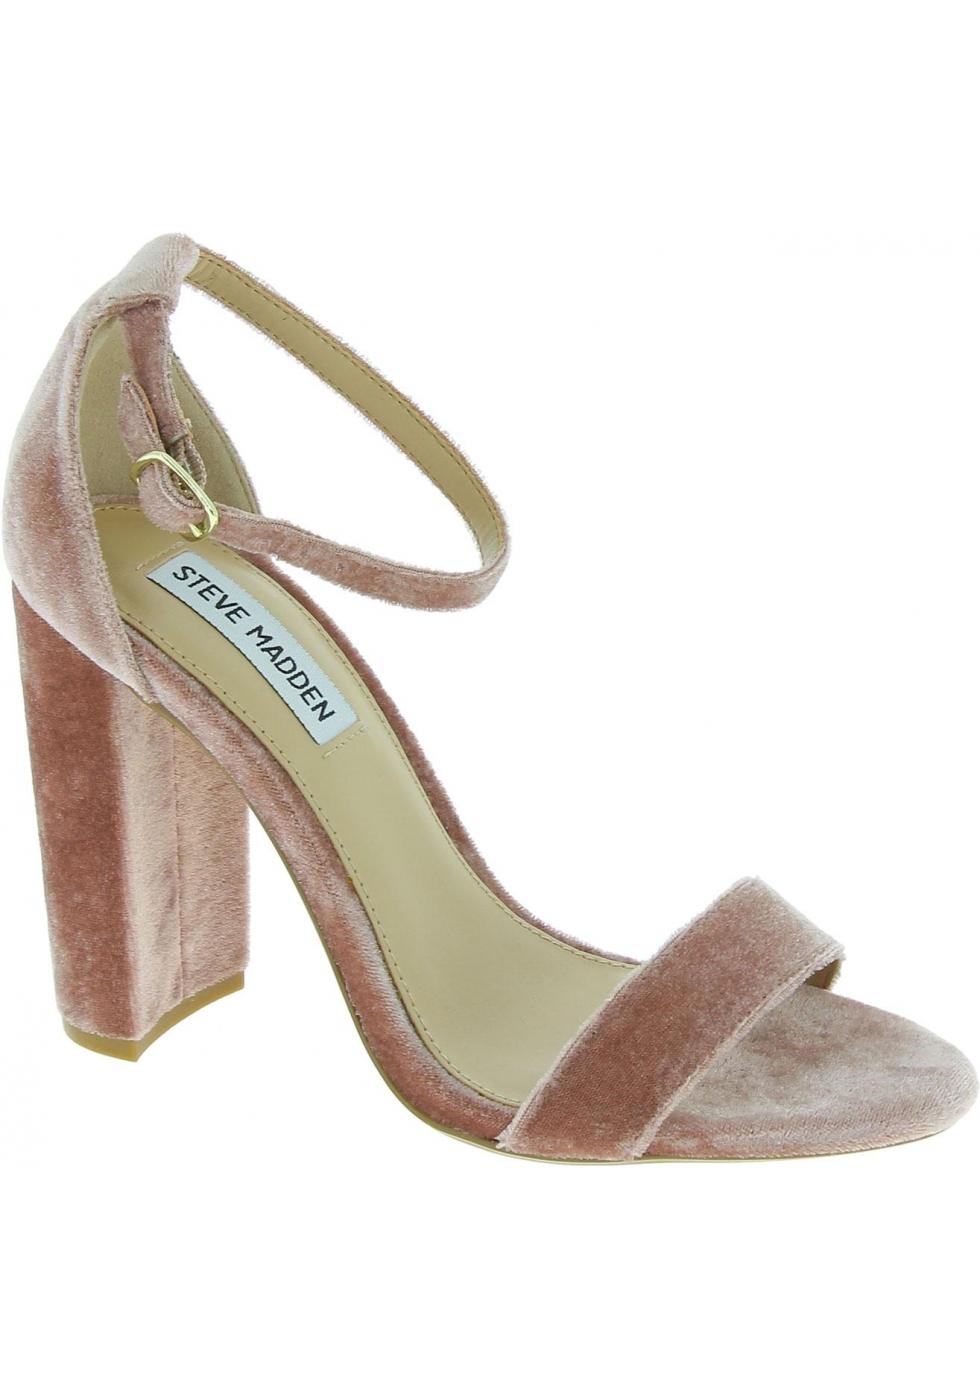 Paquete o empaquetar un acreedor Asentar  Steve Madden Women's ankle strap block heels sandals in powder pink velvet  - Italian Boutique